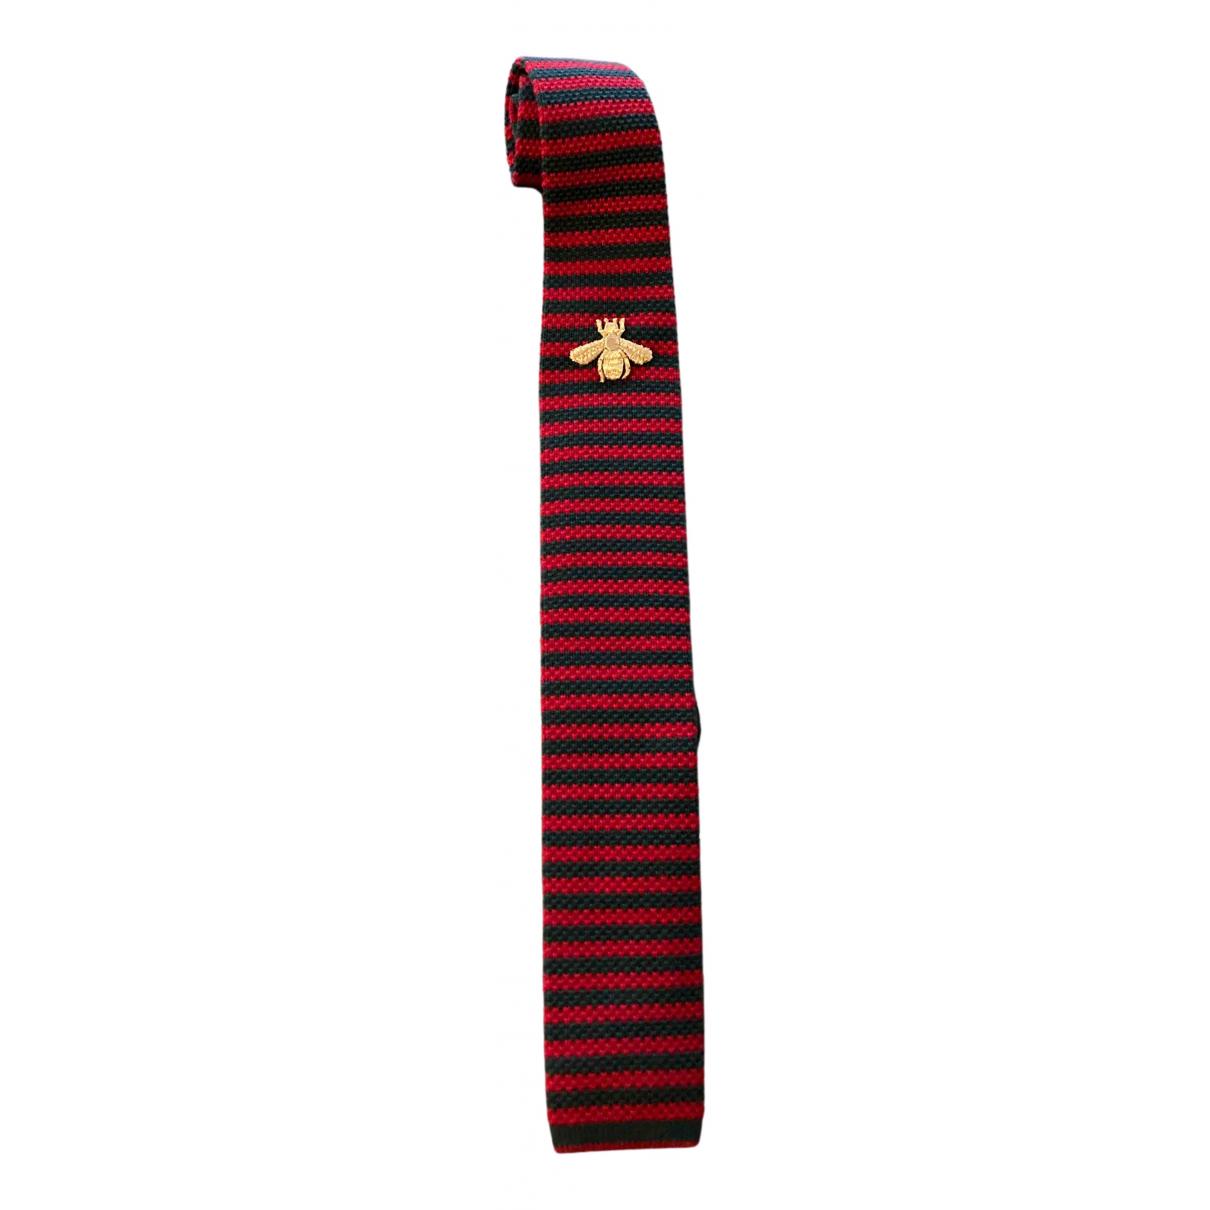 Corbata de Lana Gucci